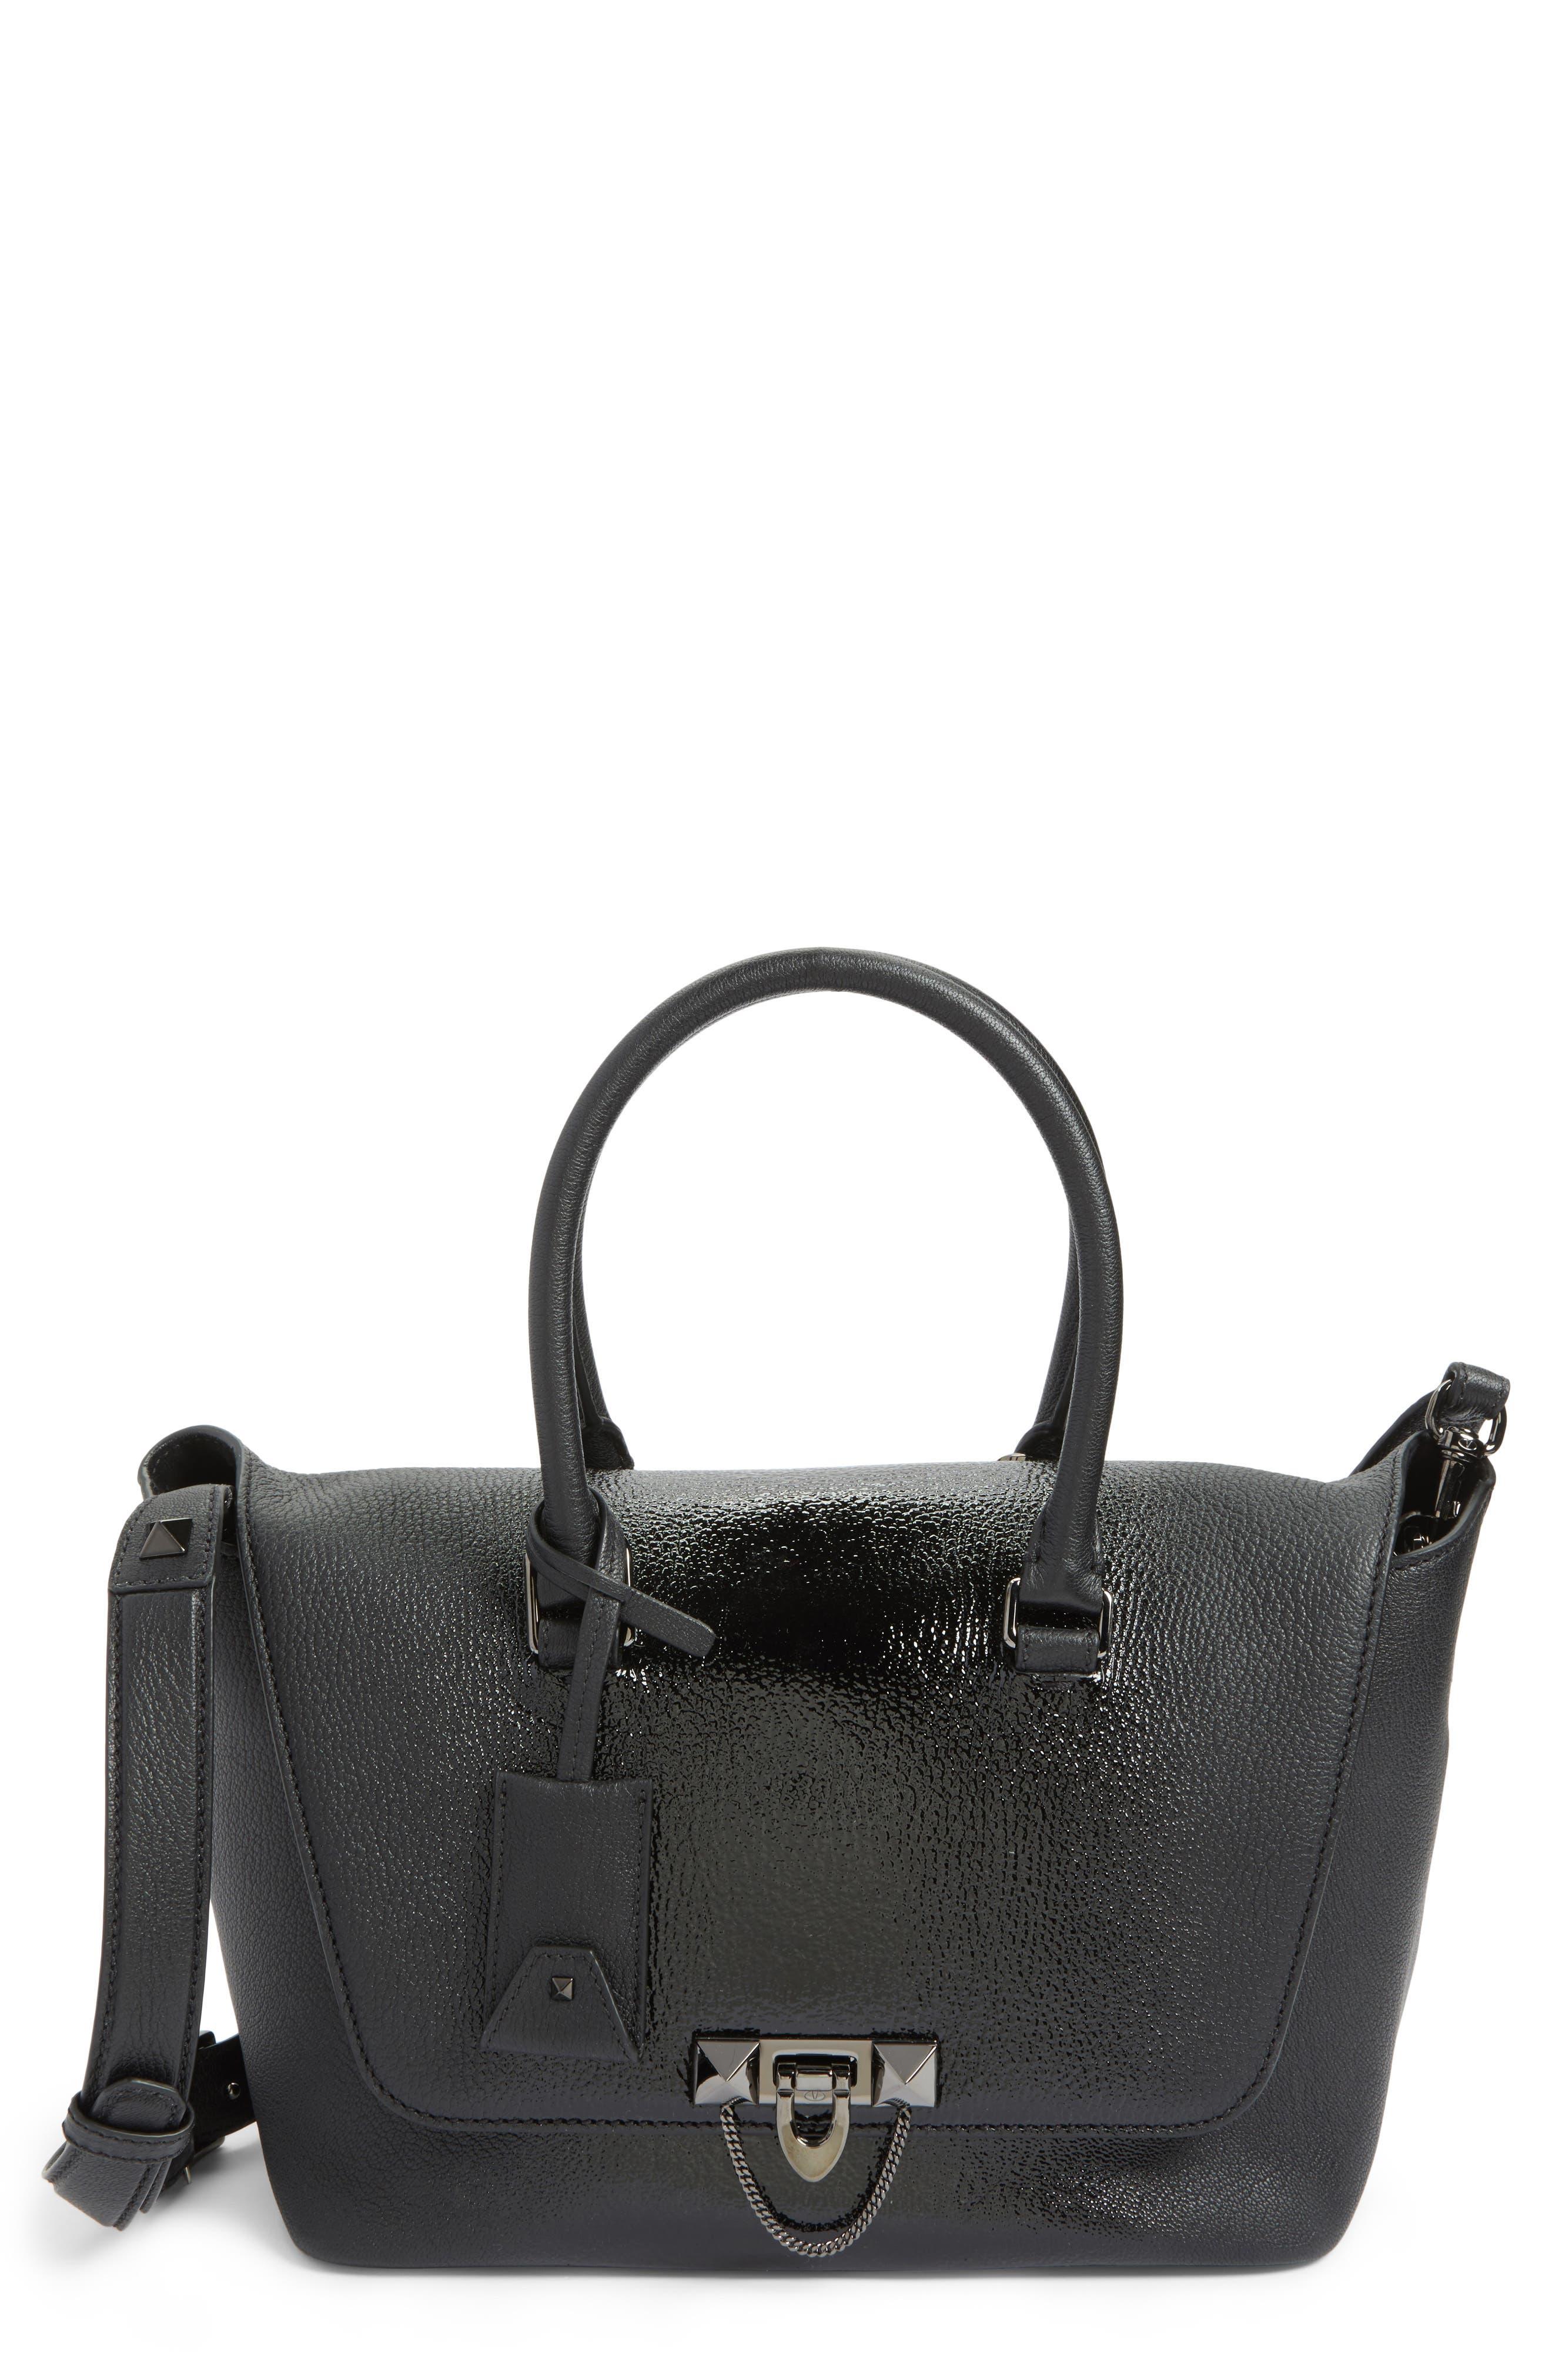 Main Image - VALENTINO GARAVANI Demilune Top Handle Leather Satchel